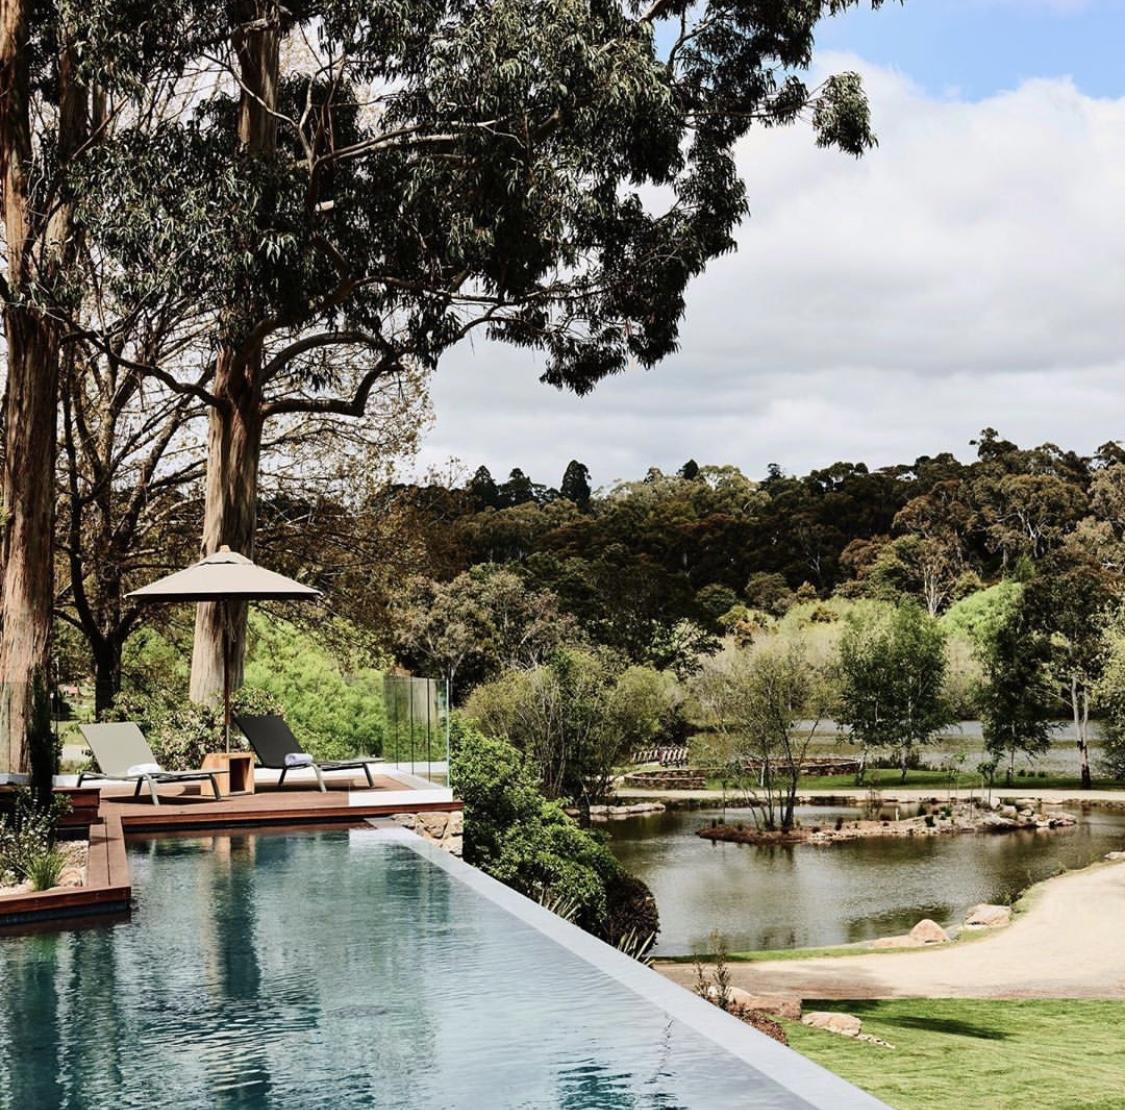 Lake House in Daylesford, Victoria, Australia